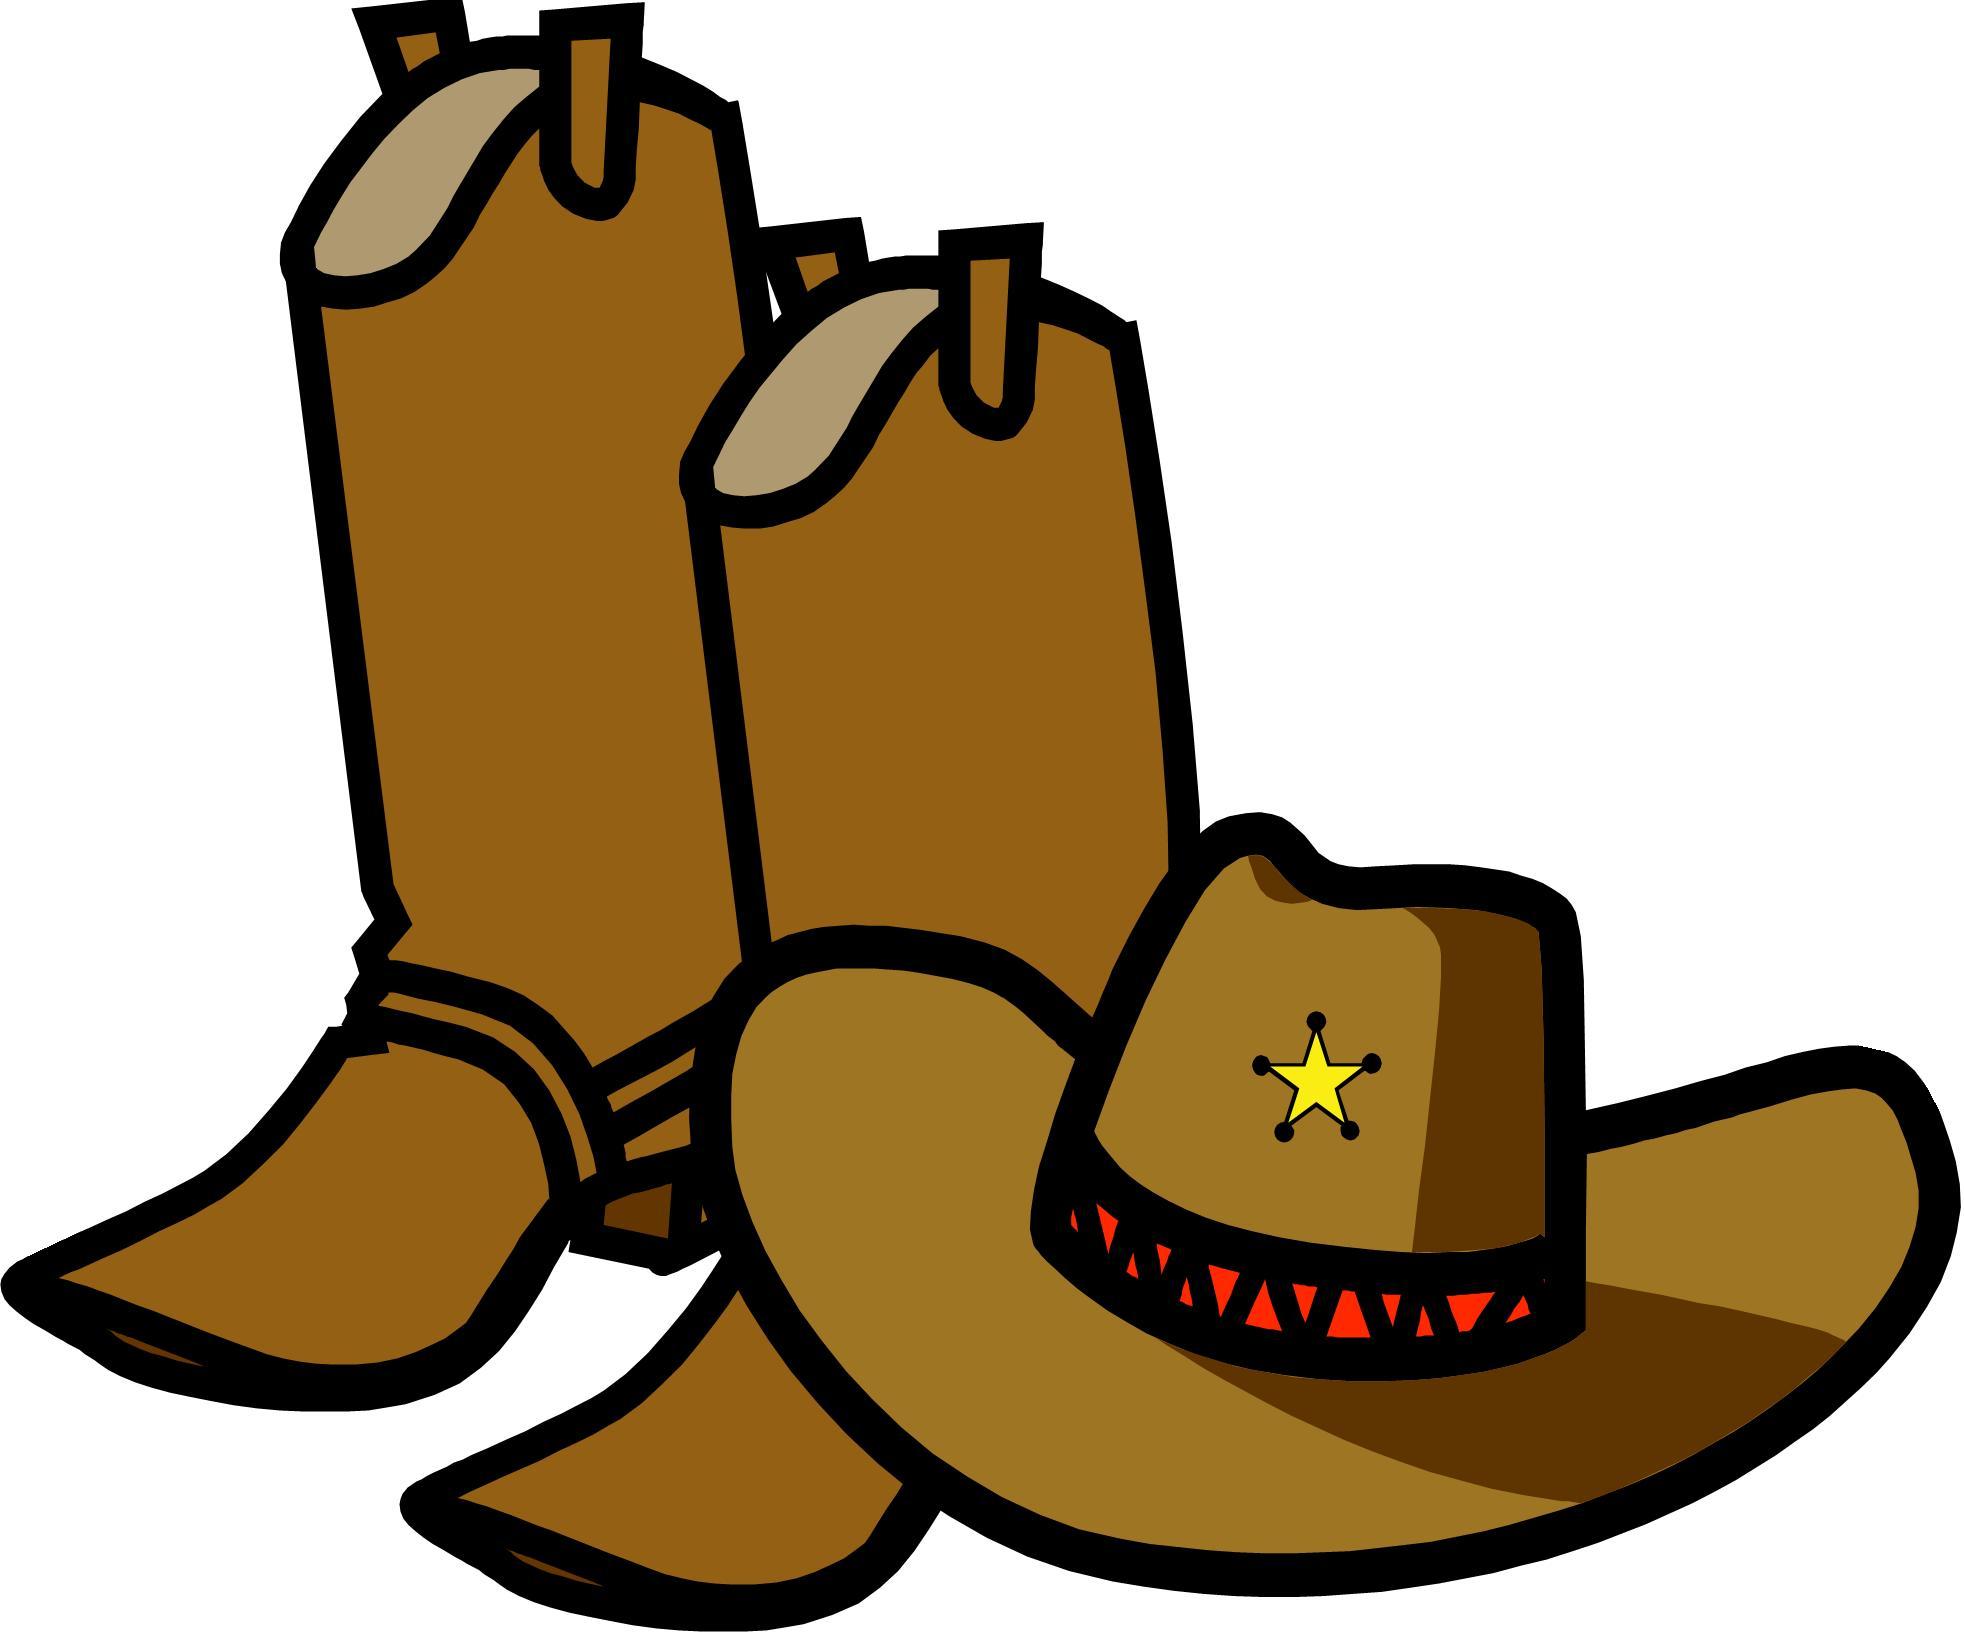 Clipart Cowboy Boots & Cowboy Boots Clip Art Images - ClipartALL.com banner royalty free